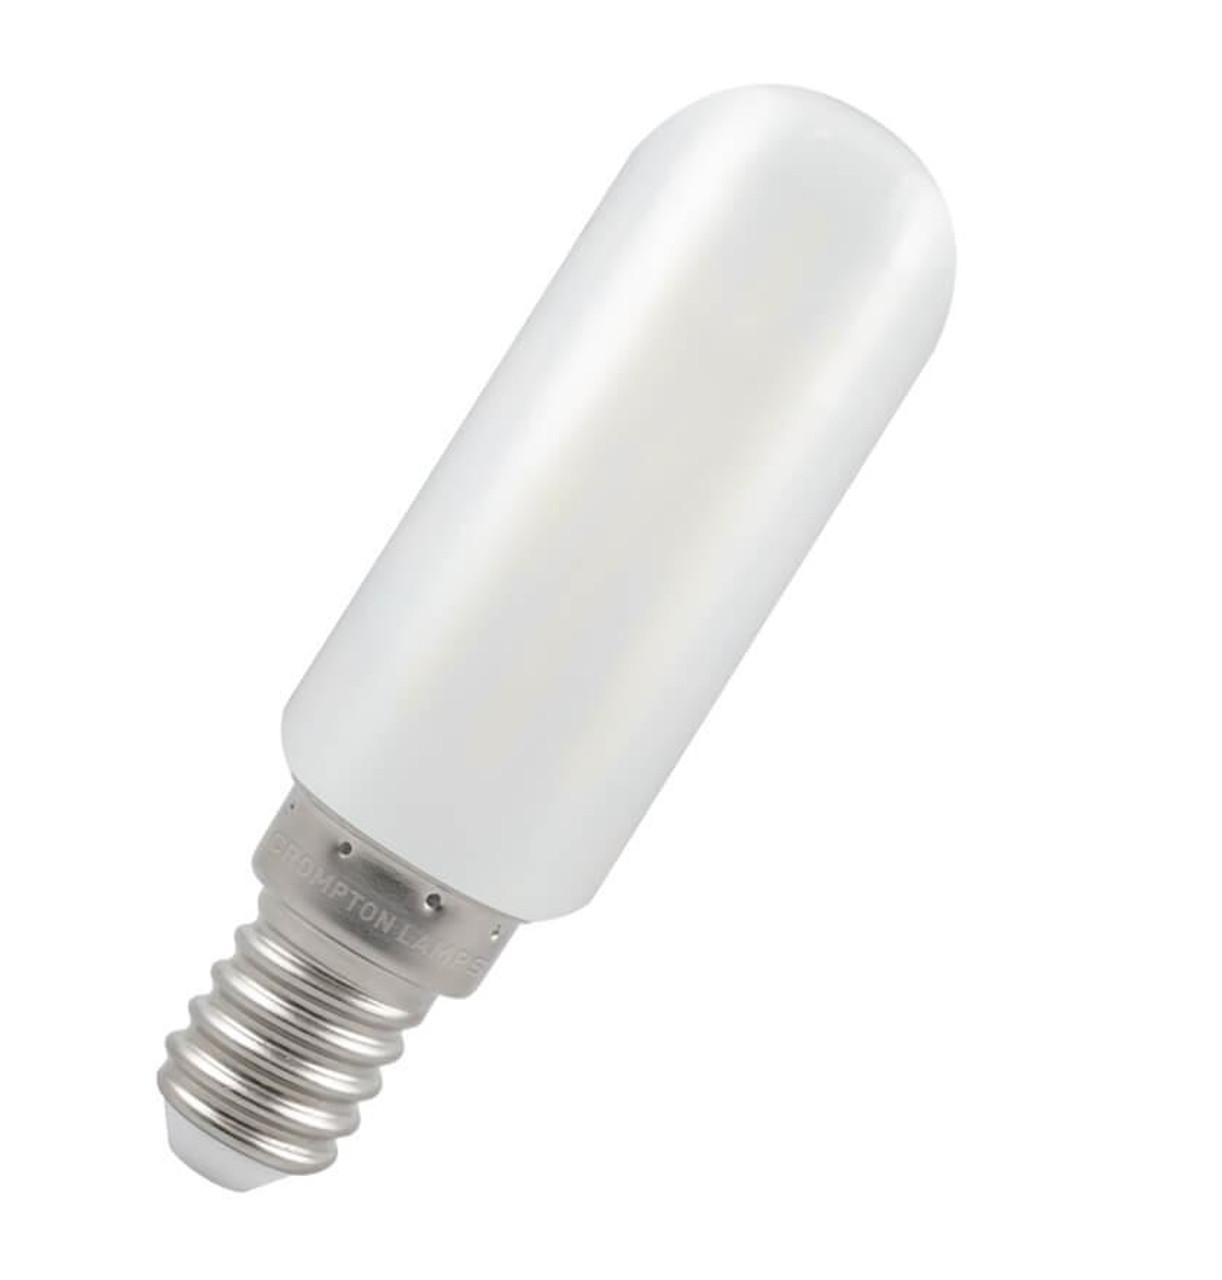 LED Filament Cooker Hood Light Bulb 4.7W E14 2700K Warm White Crompton 12837